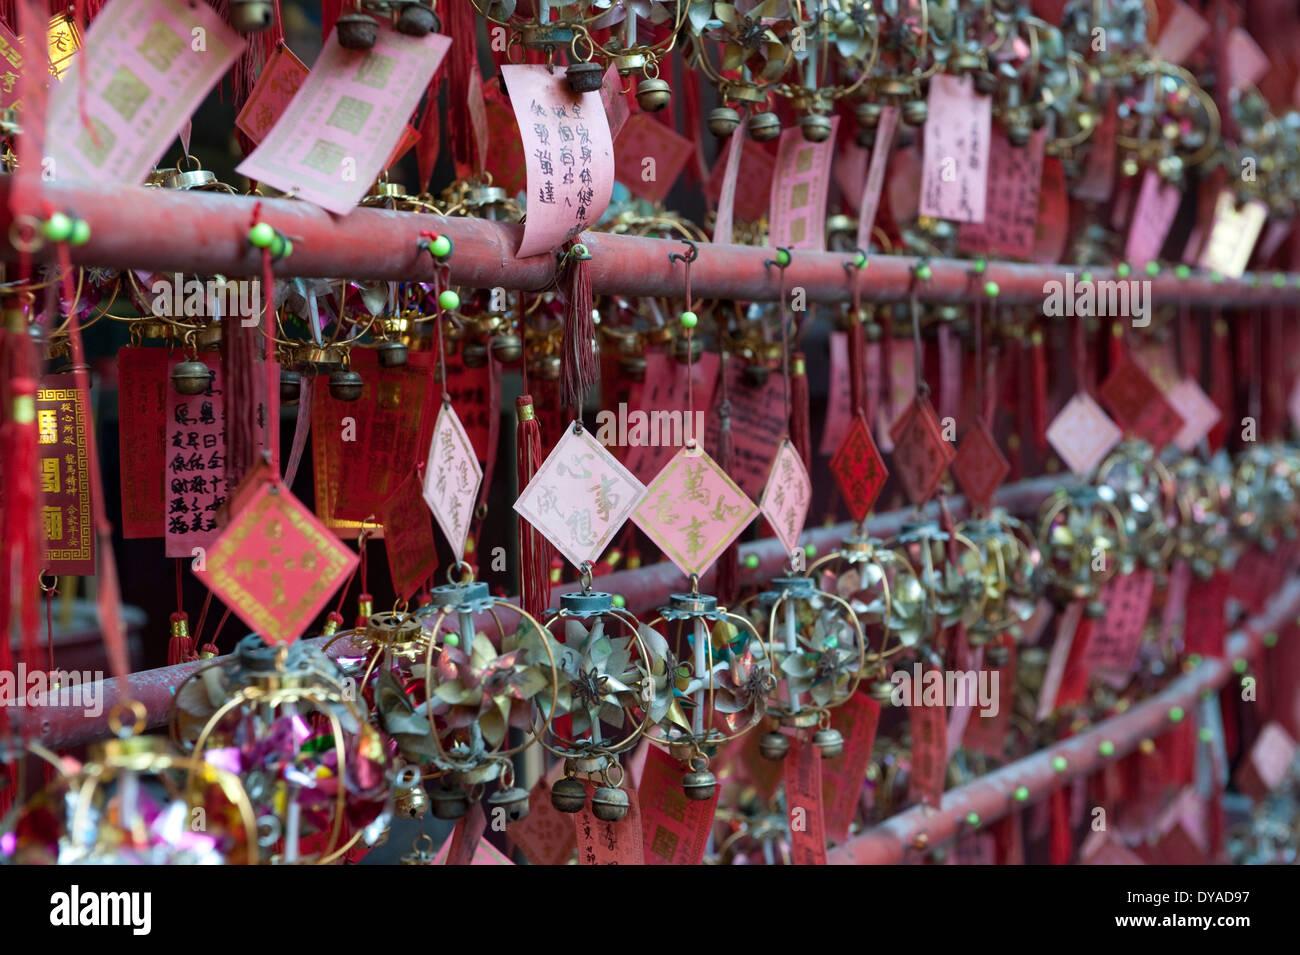 A-ma, temple, Buddhism, China, Asia, Macao, Macau - Stock Image